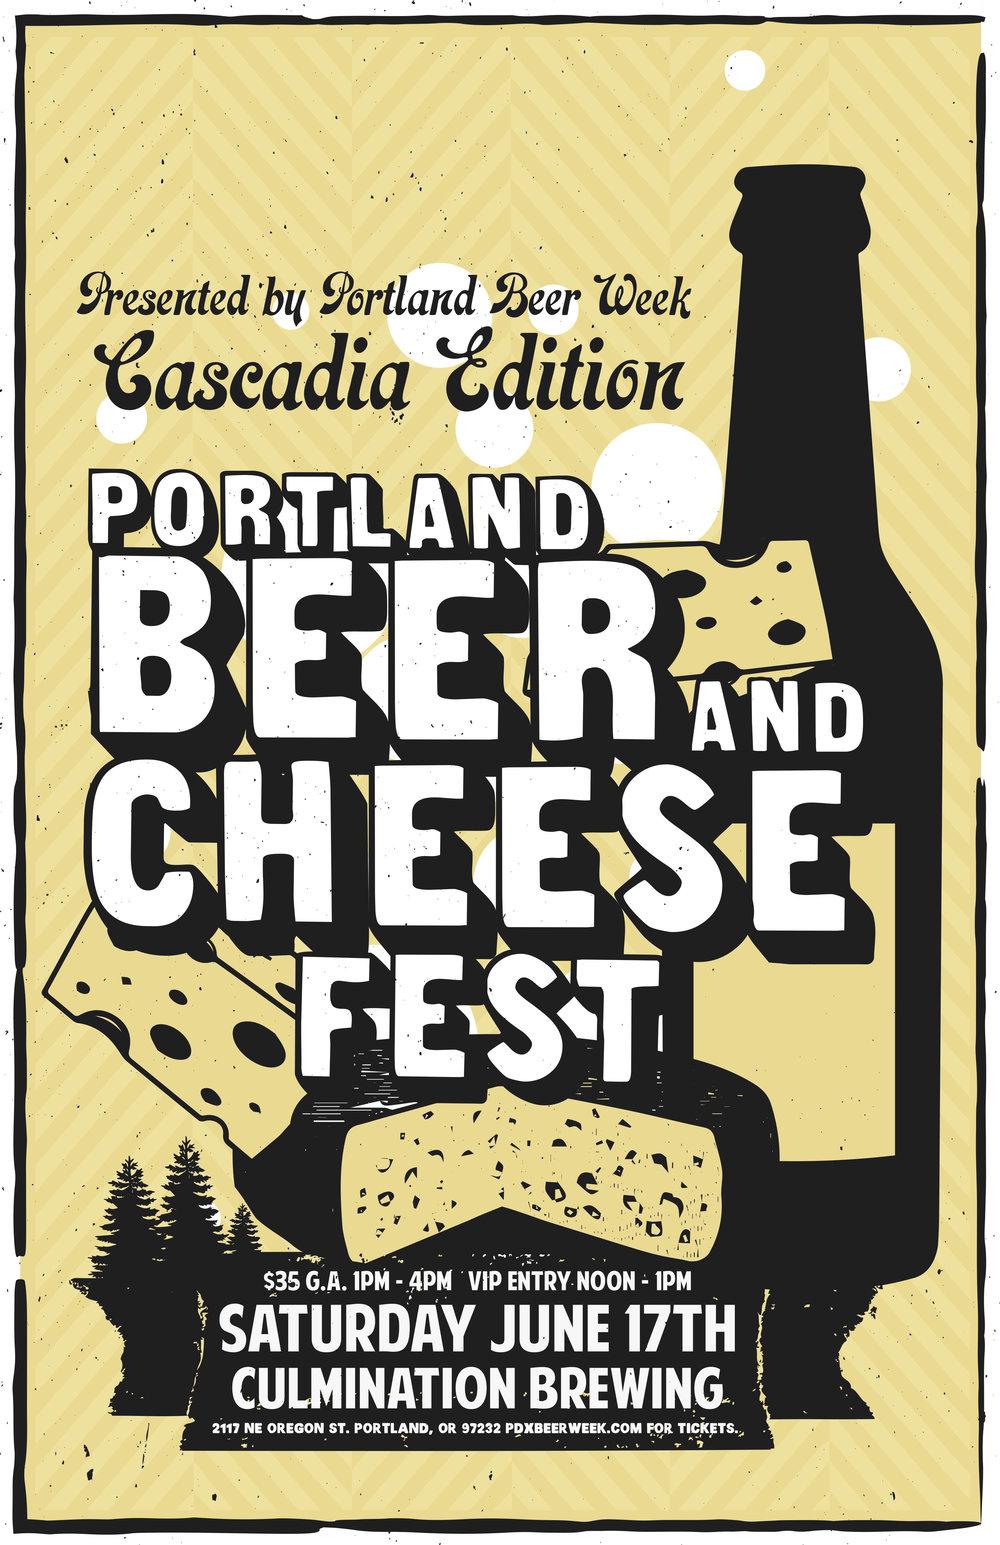 PortlandBeerAndCheeseFest